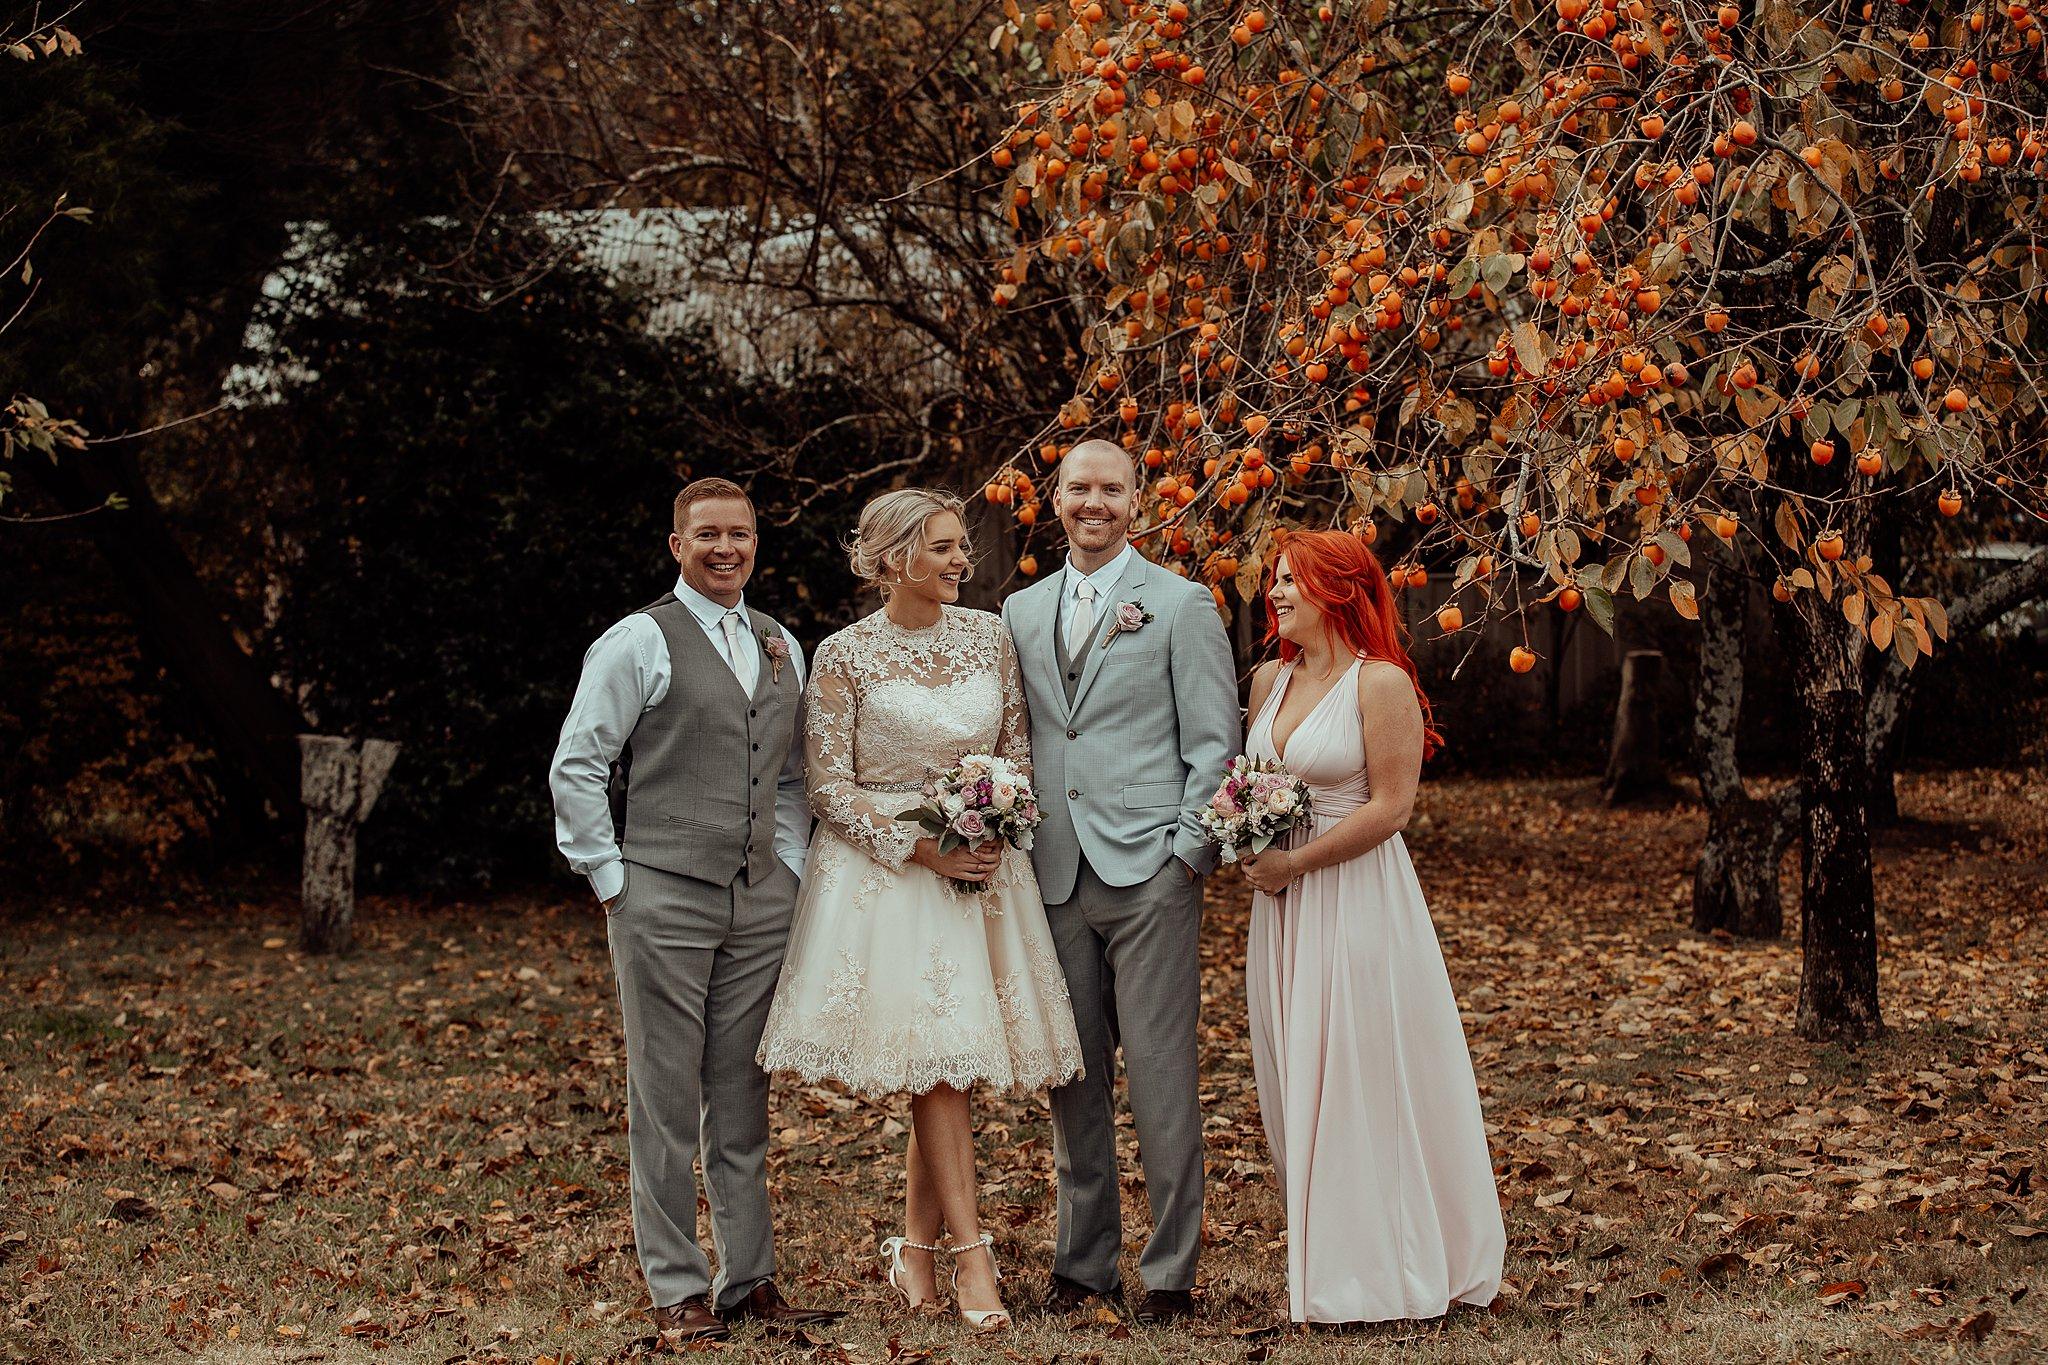 mickalathomas_puremacphotography_weddingphotographer_couplephotographer_Sheppartonphotographer_3445.jpg